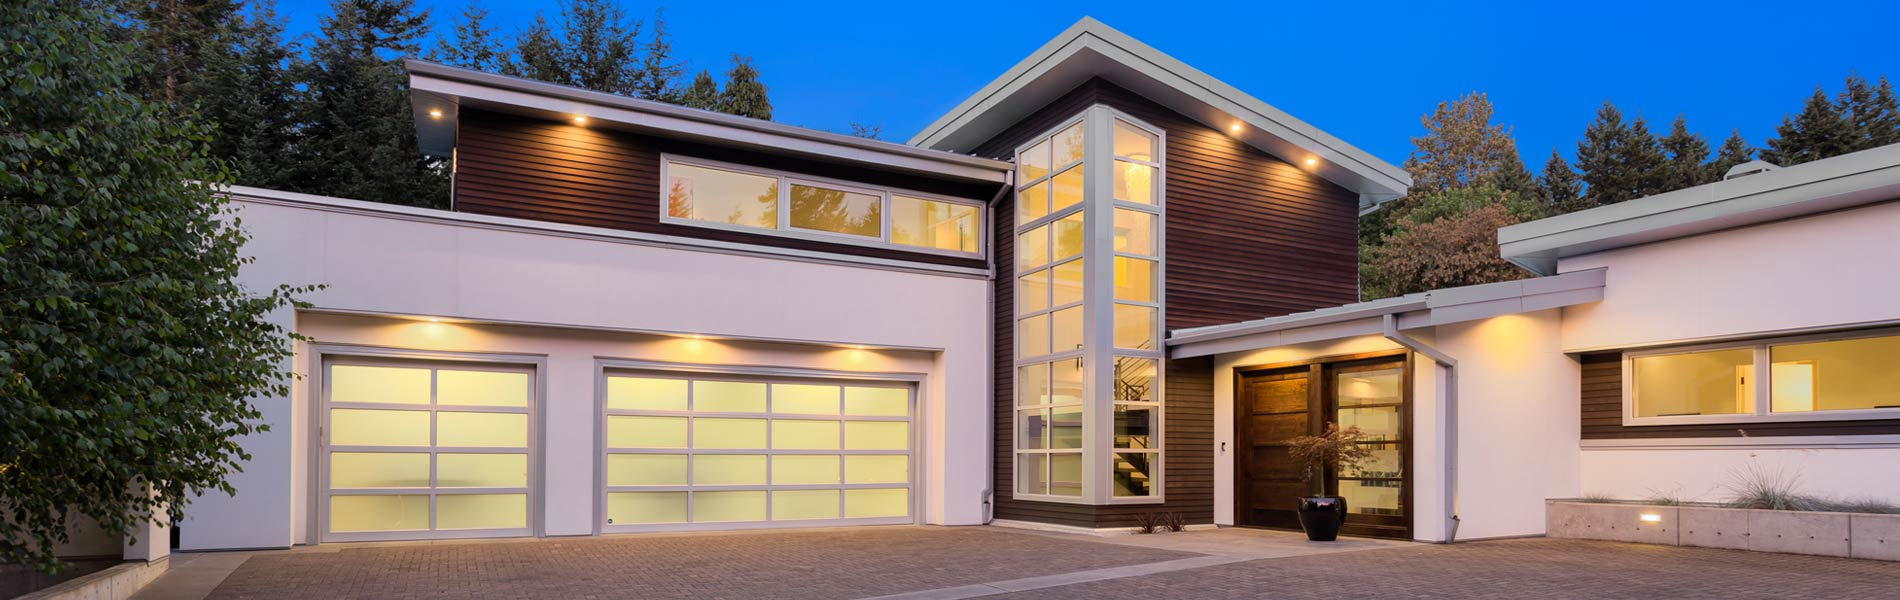 Garage doors store repairs emergency garage door cable for Garage door repair lake worth fl